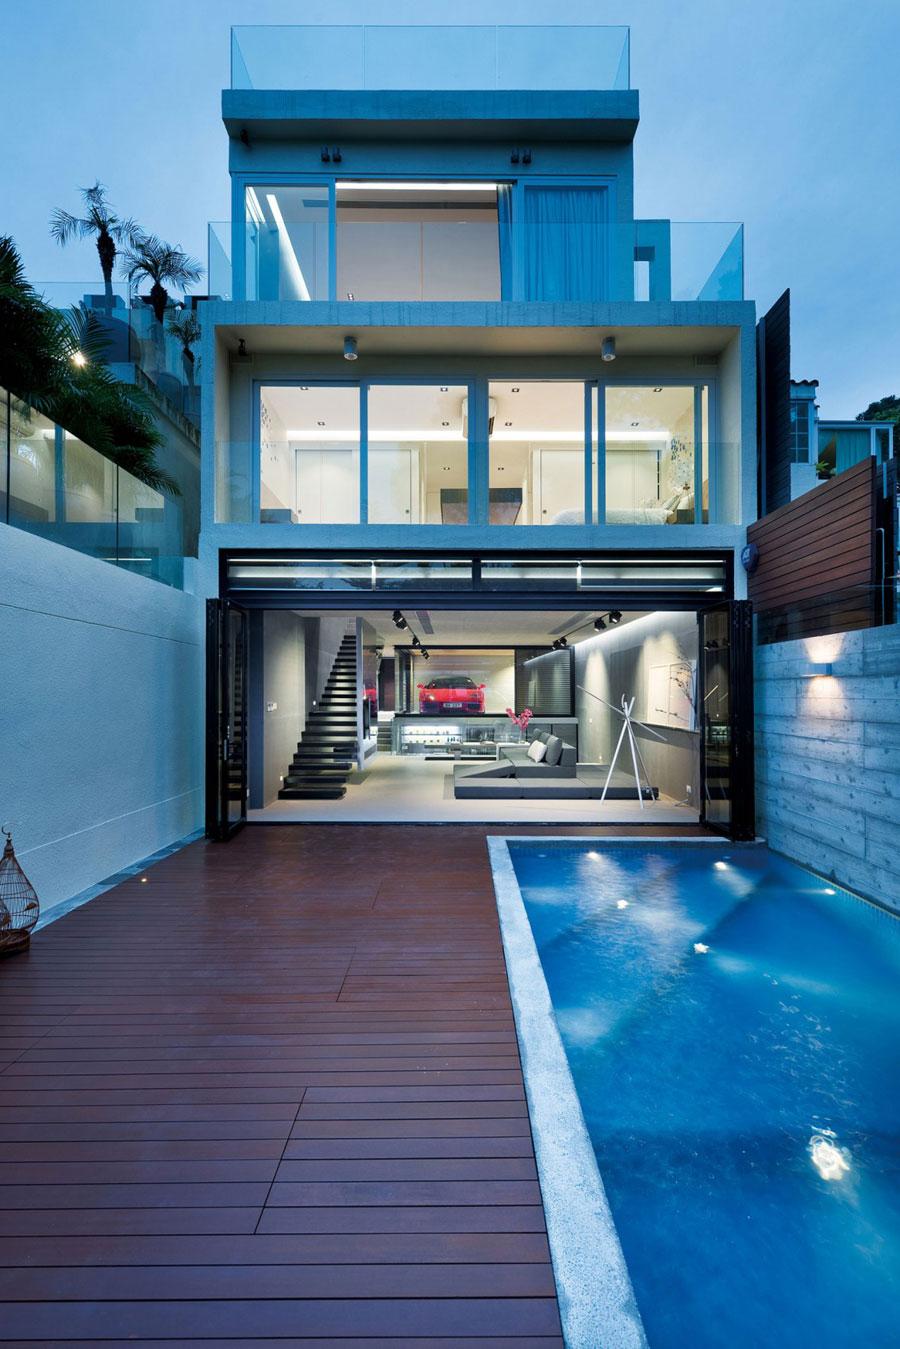 sleek and modern interior design of a split level home 1 sleek and modern interior design of a split level home